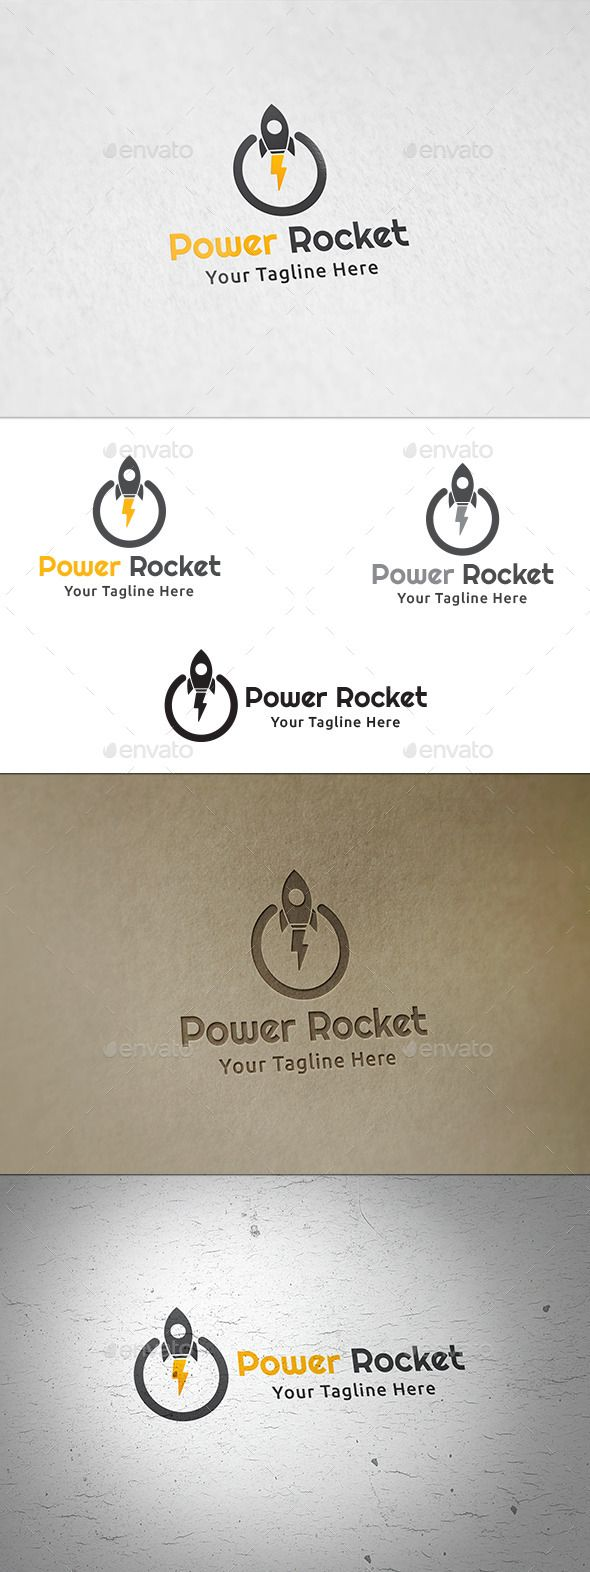 Power Rocket - Logo Template